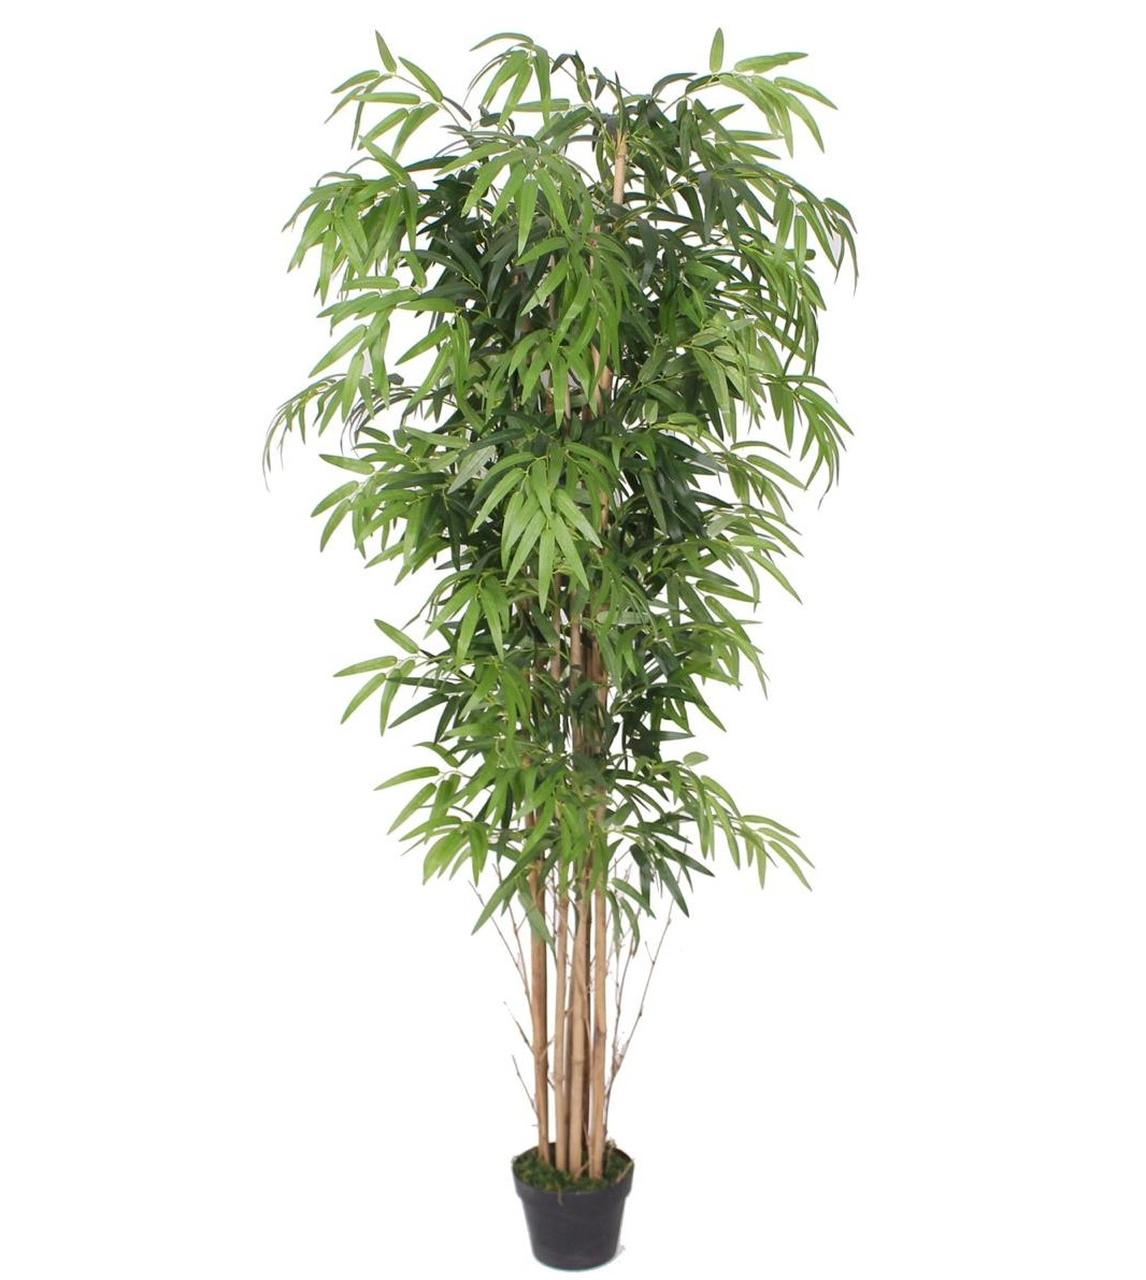 Planta Bambu Caule Natural Permanente 1,80 cm